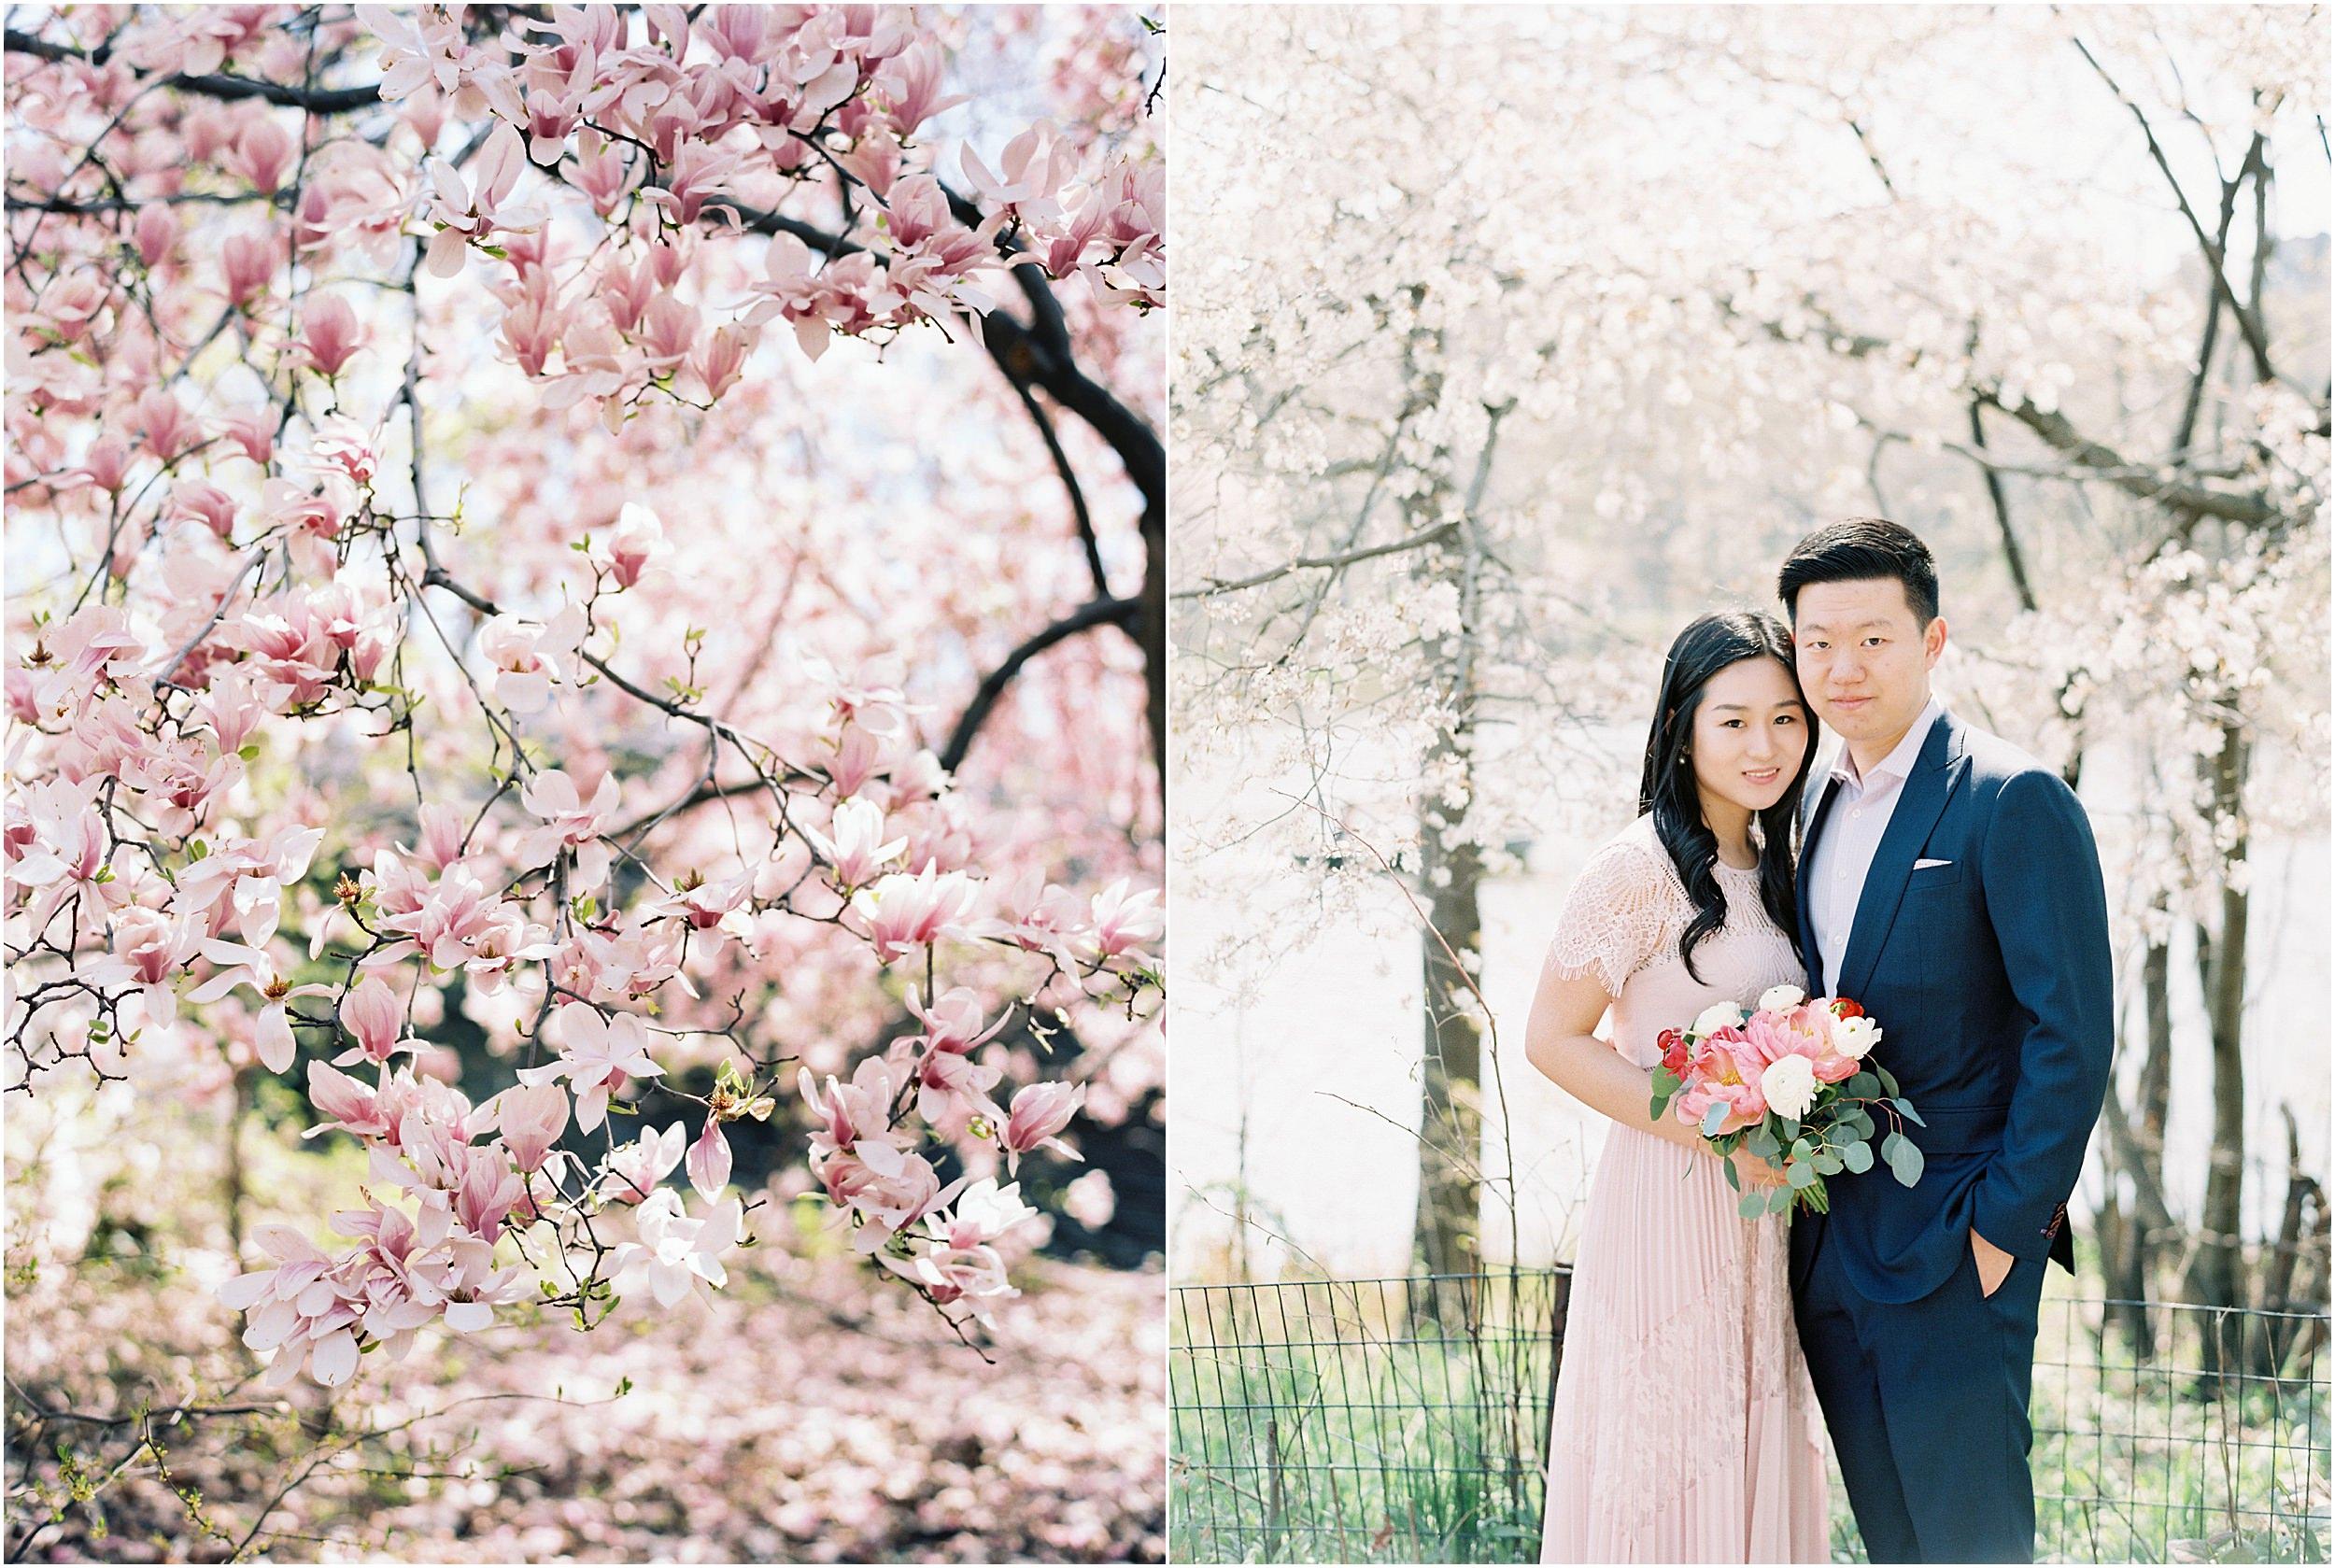 JeremiahRachelPhotography_CentralPark_NYC_SpringtimeBloom_EngagementSession0003.JPG